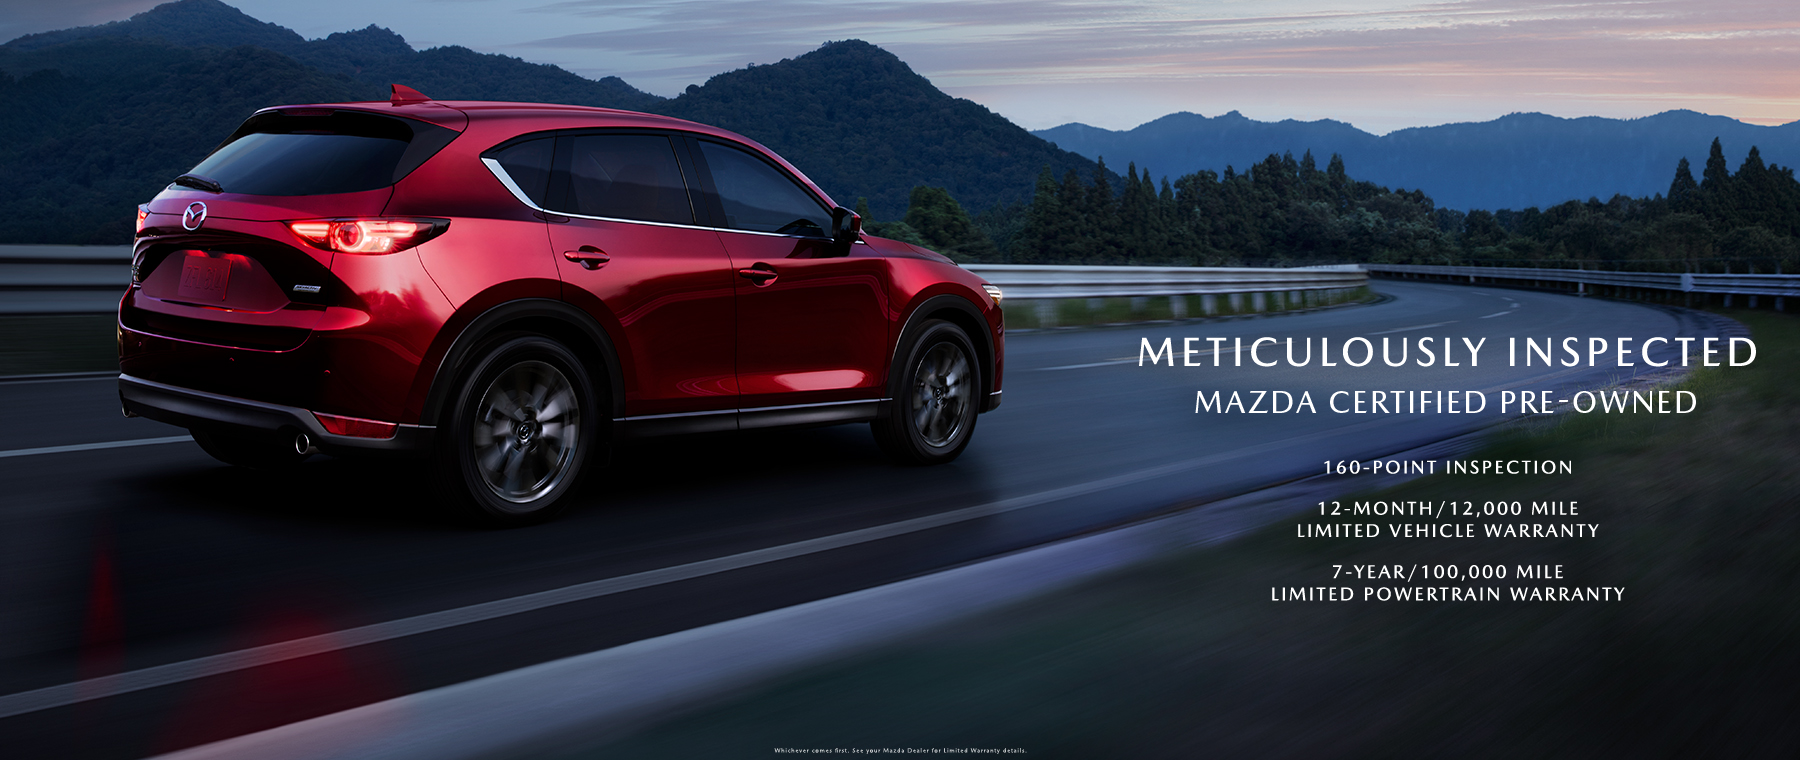 Mazda CPO dealers on the 2020 CX-9, CX-5 and Mazda3 Sedan